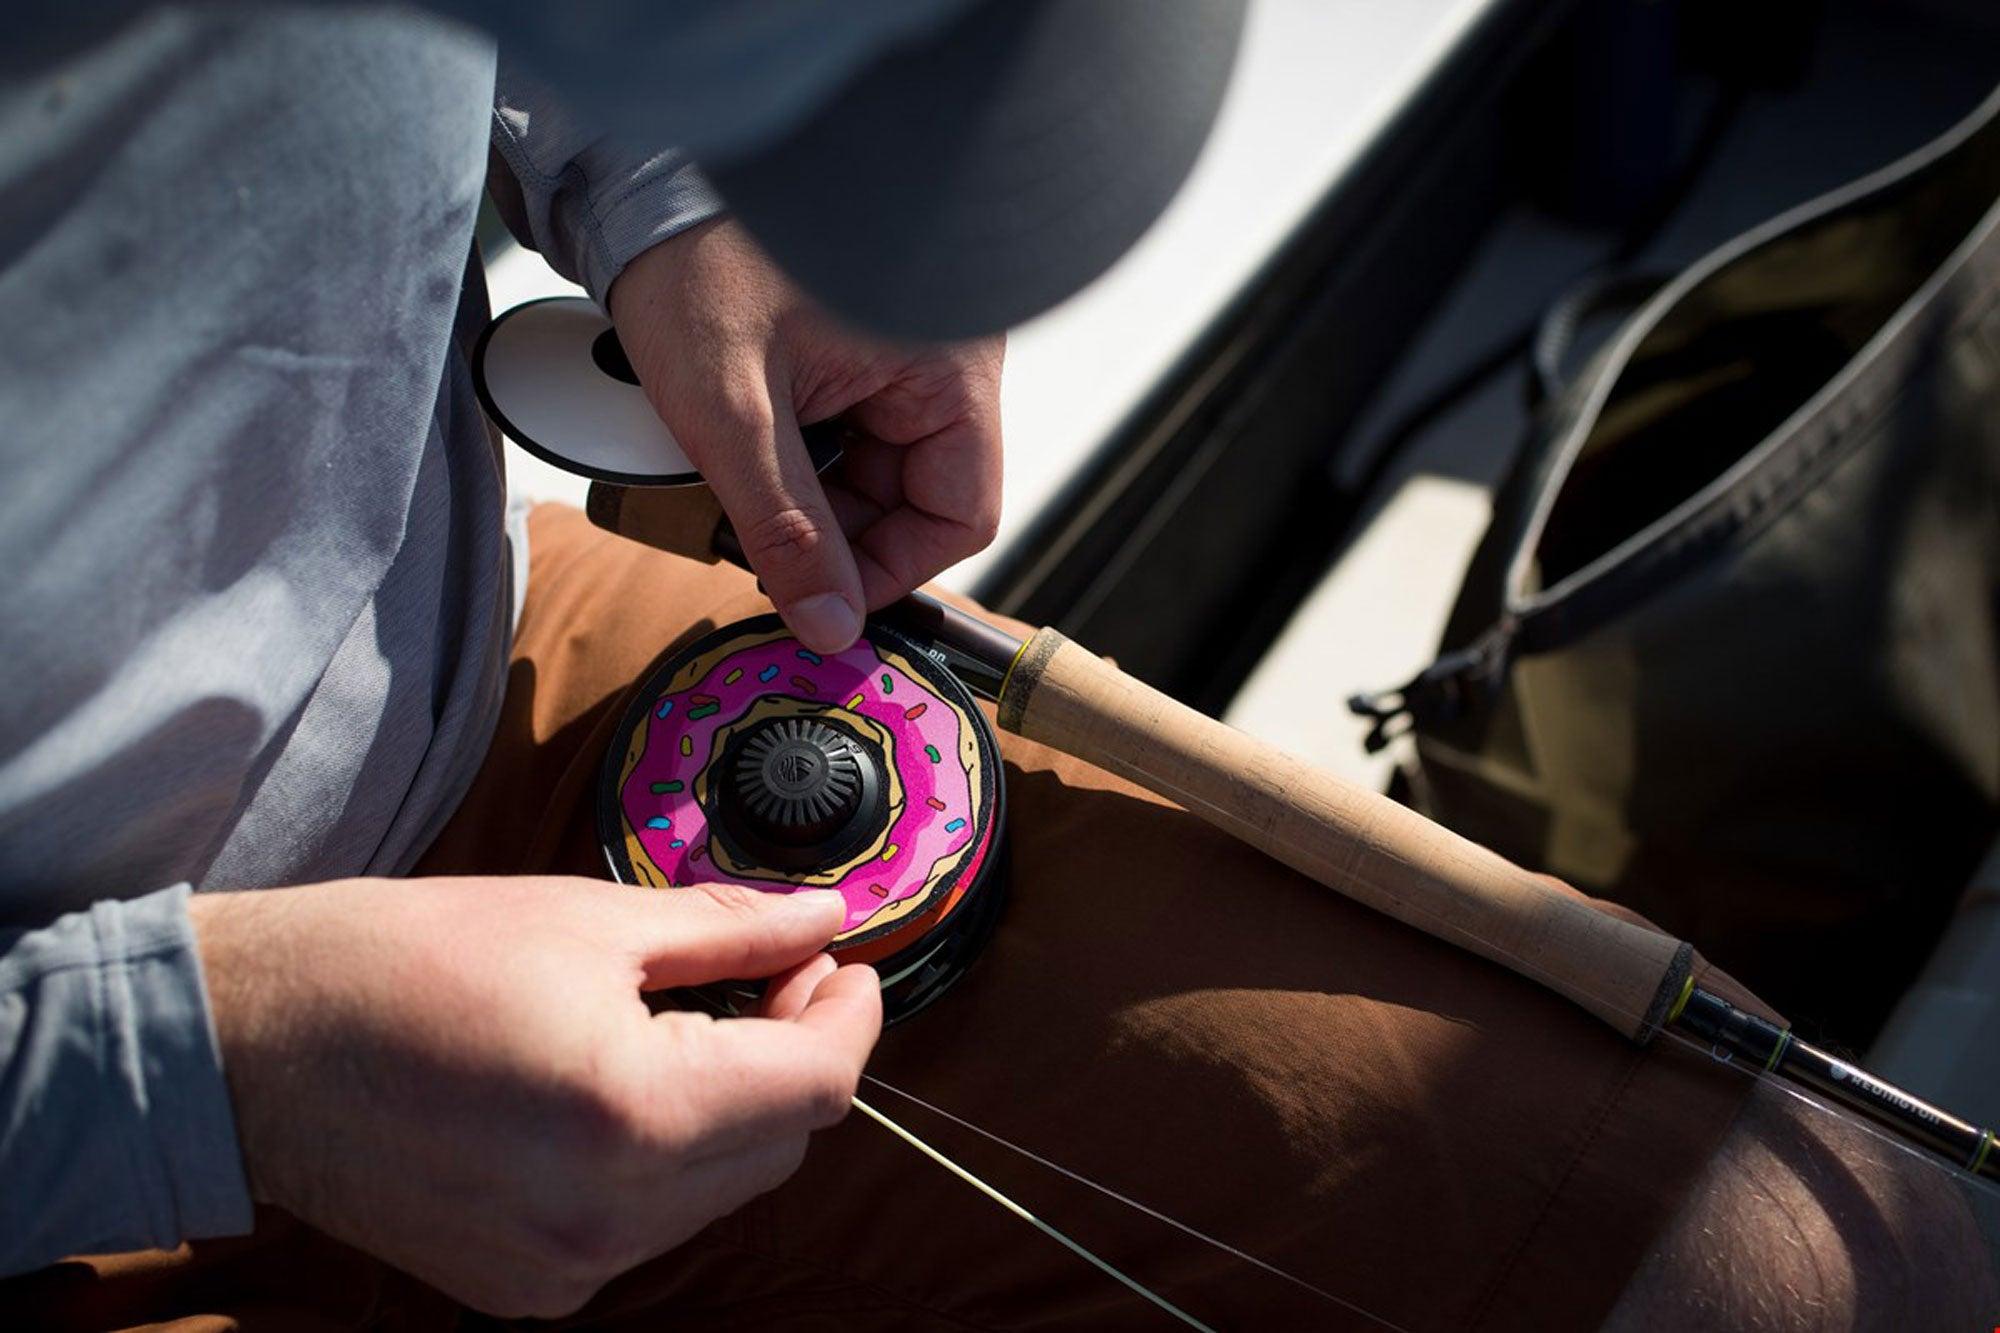 Redington ID fly fishing reel